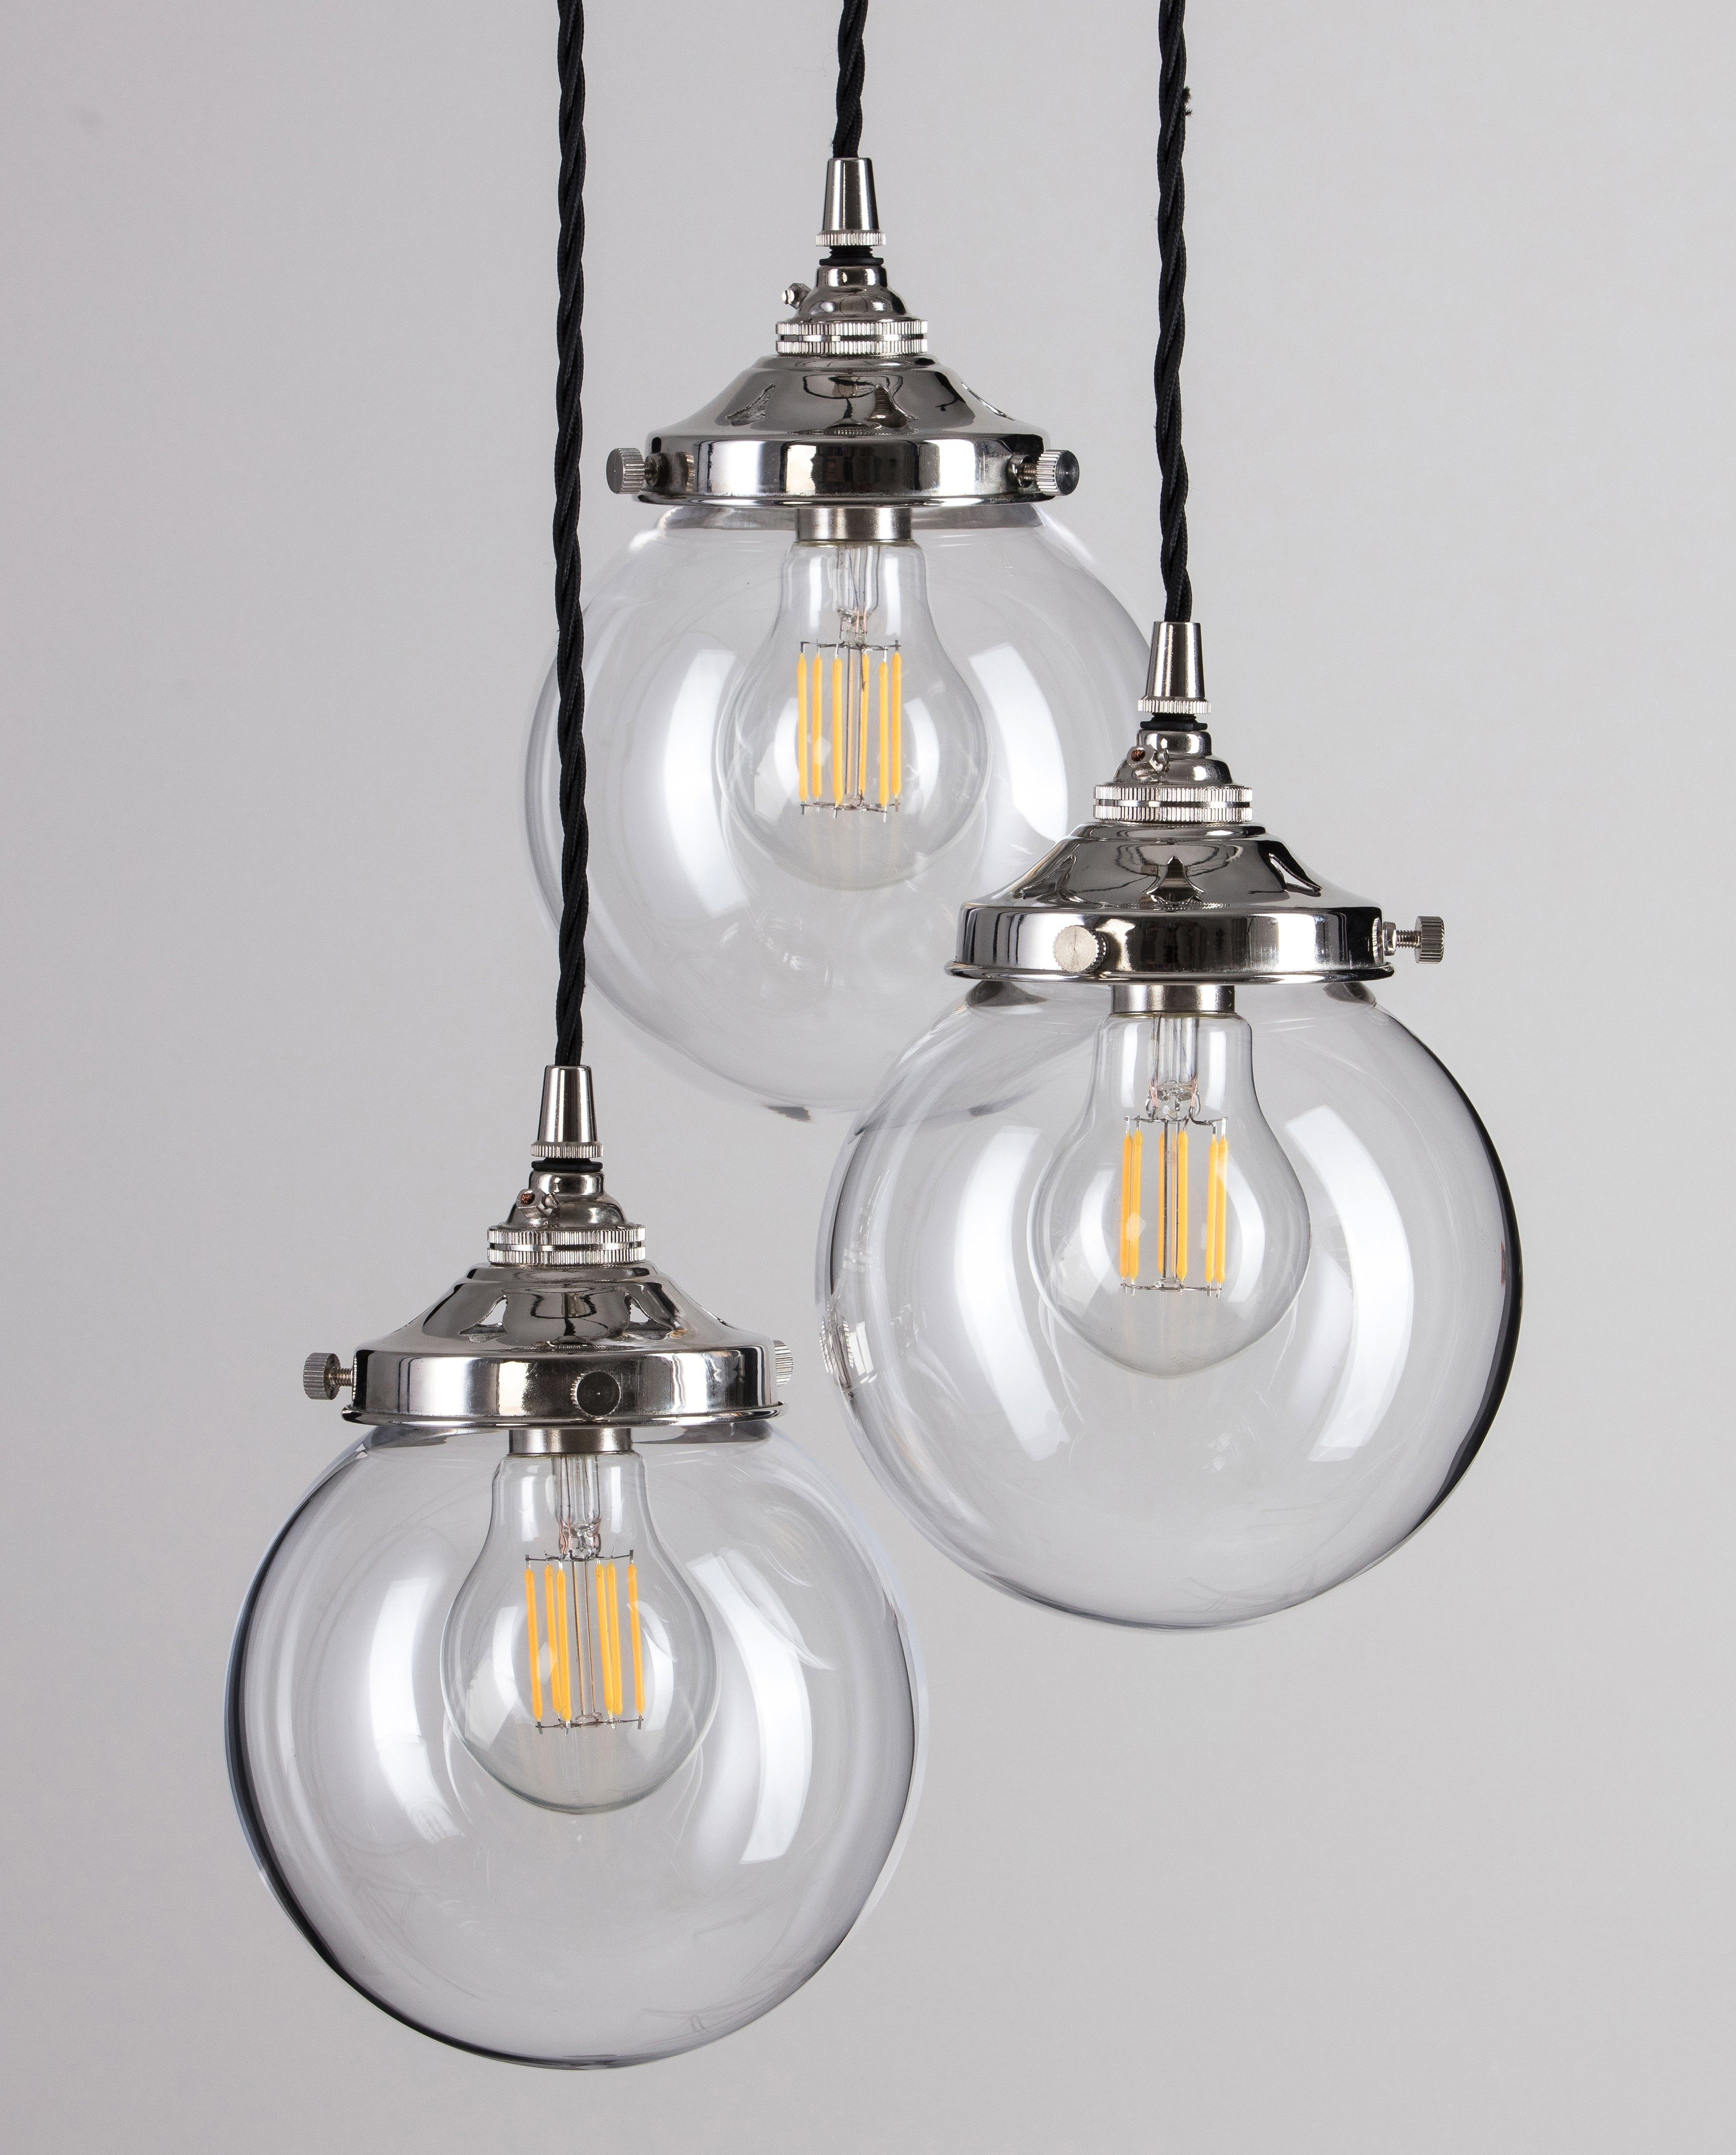 Glass Globe Cluster Pendant Light - Polished Nickel